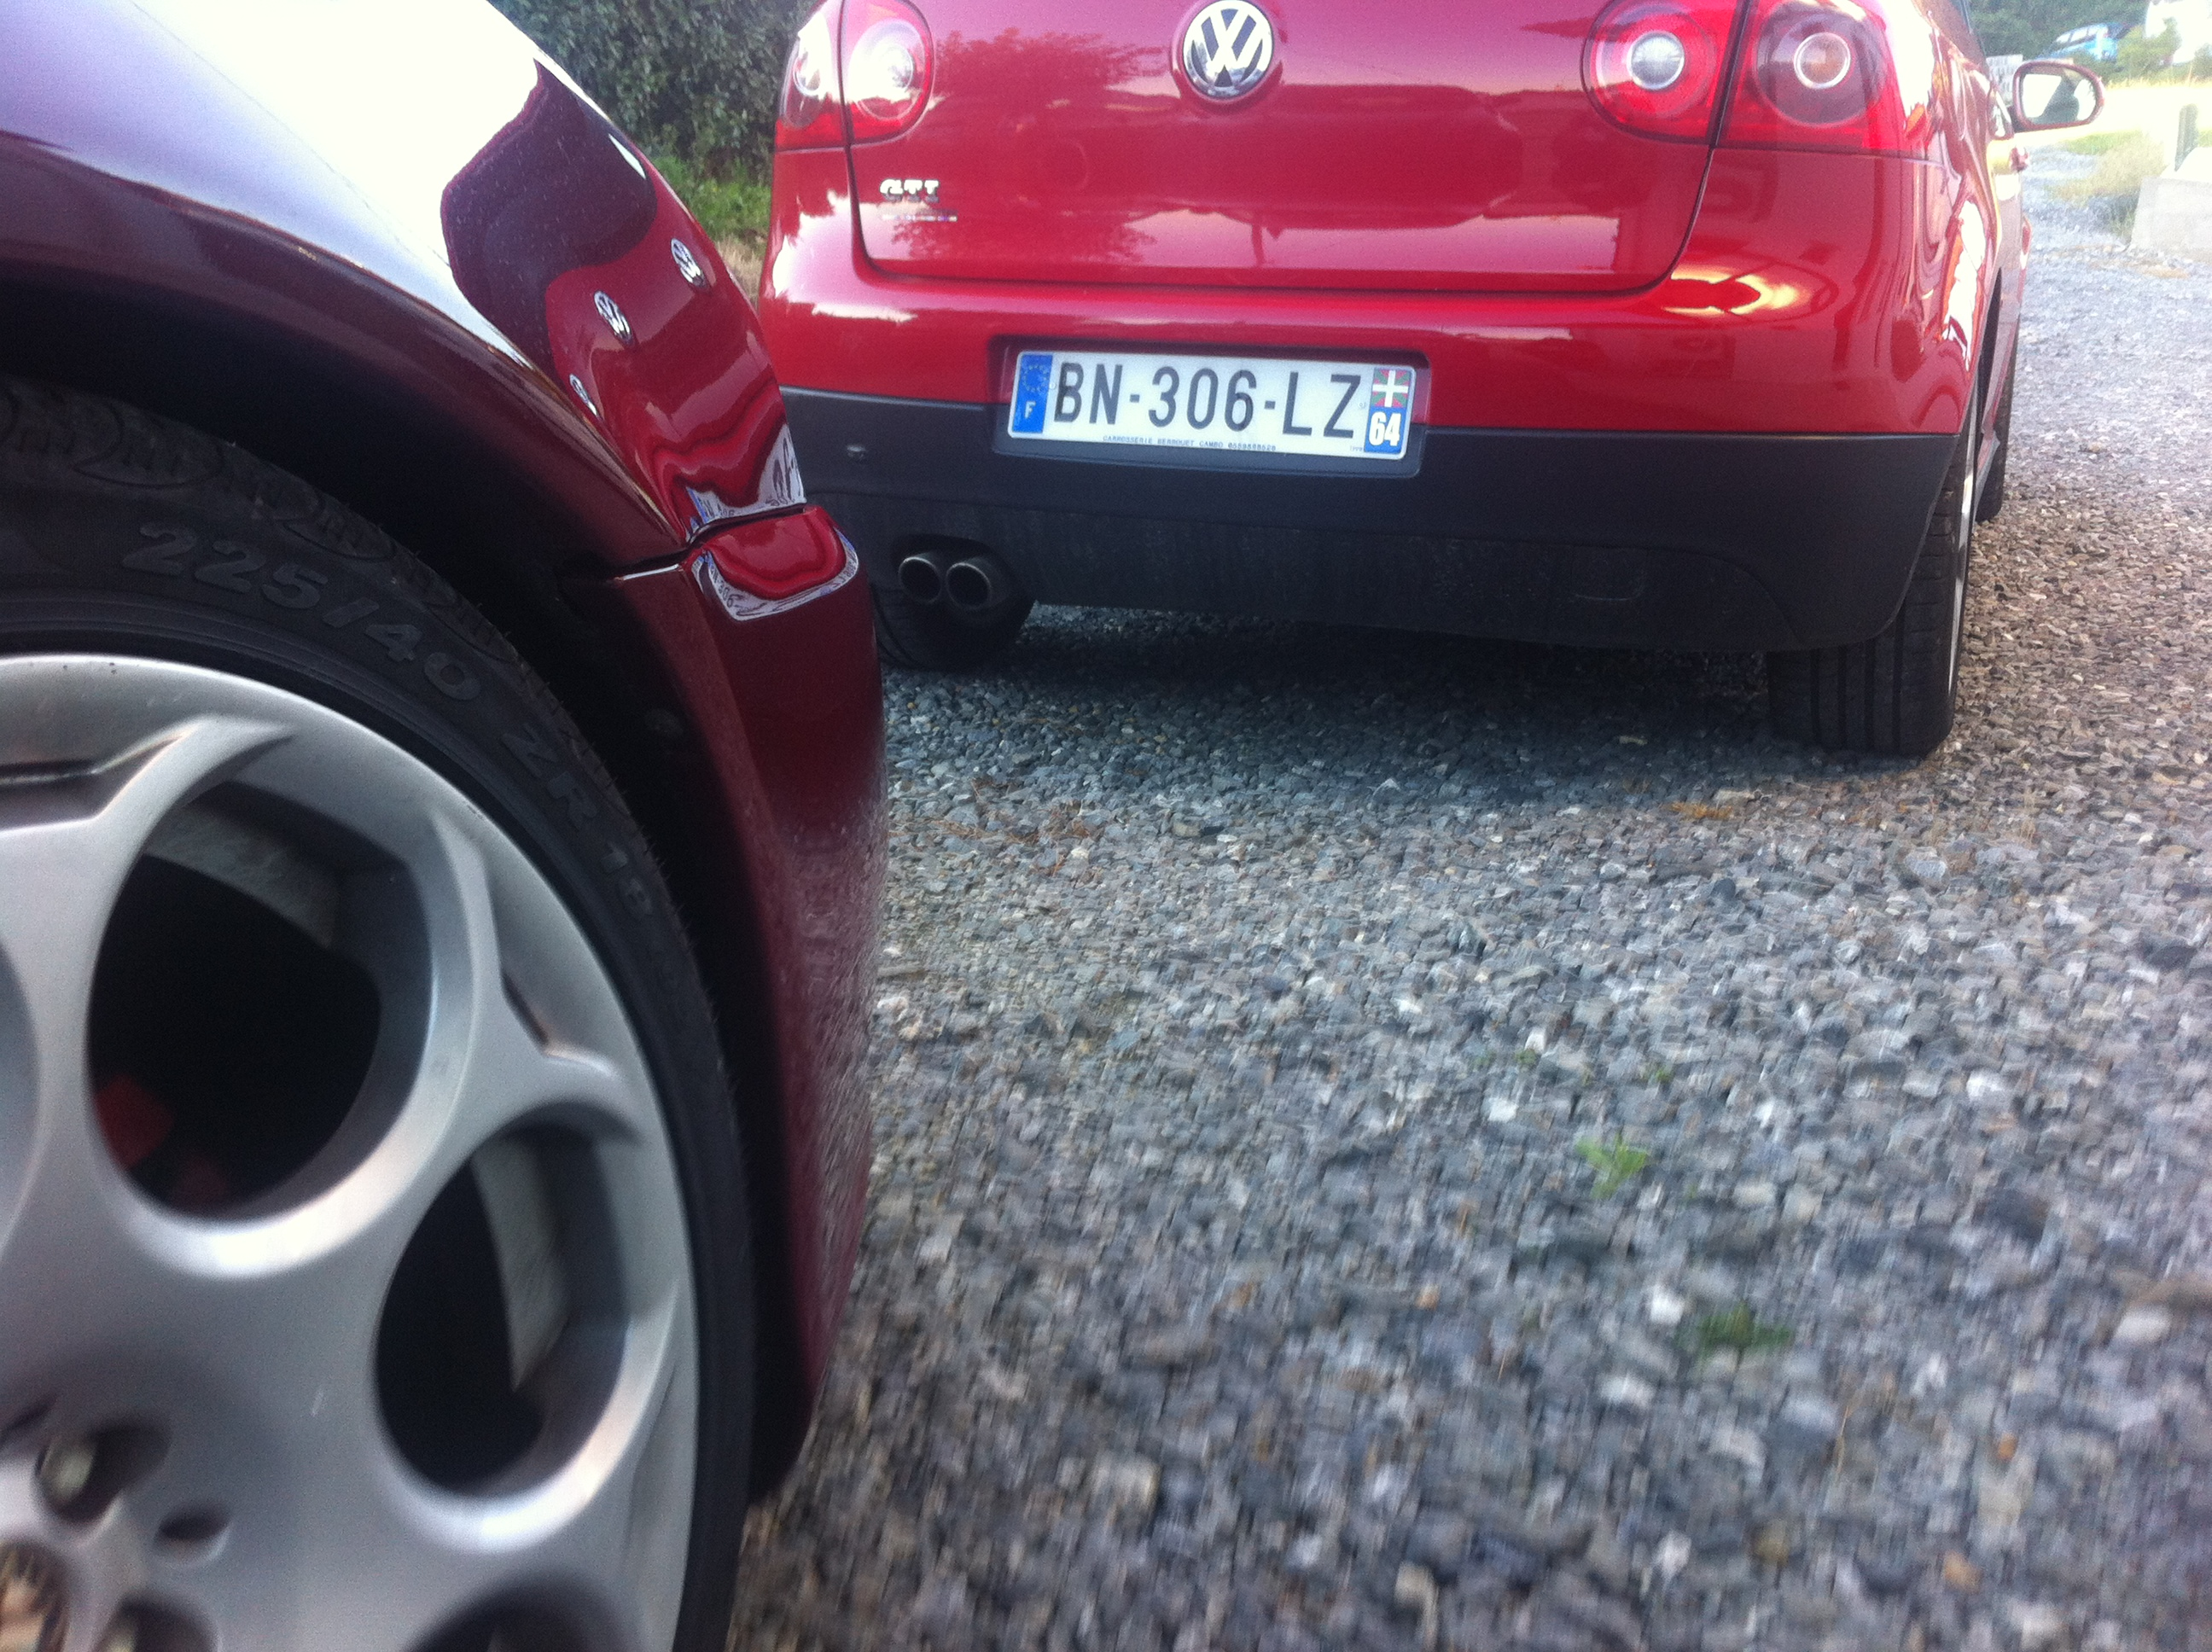 @ Edelstahl Auspuff Flexrohr Flexstück 76mm x 100mm mit Interlock Vr6 16V 1.8T @